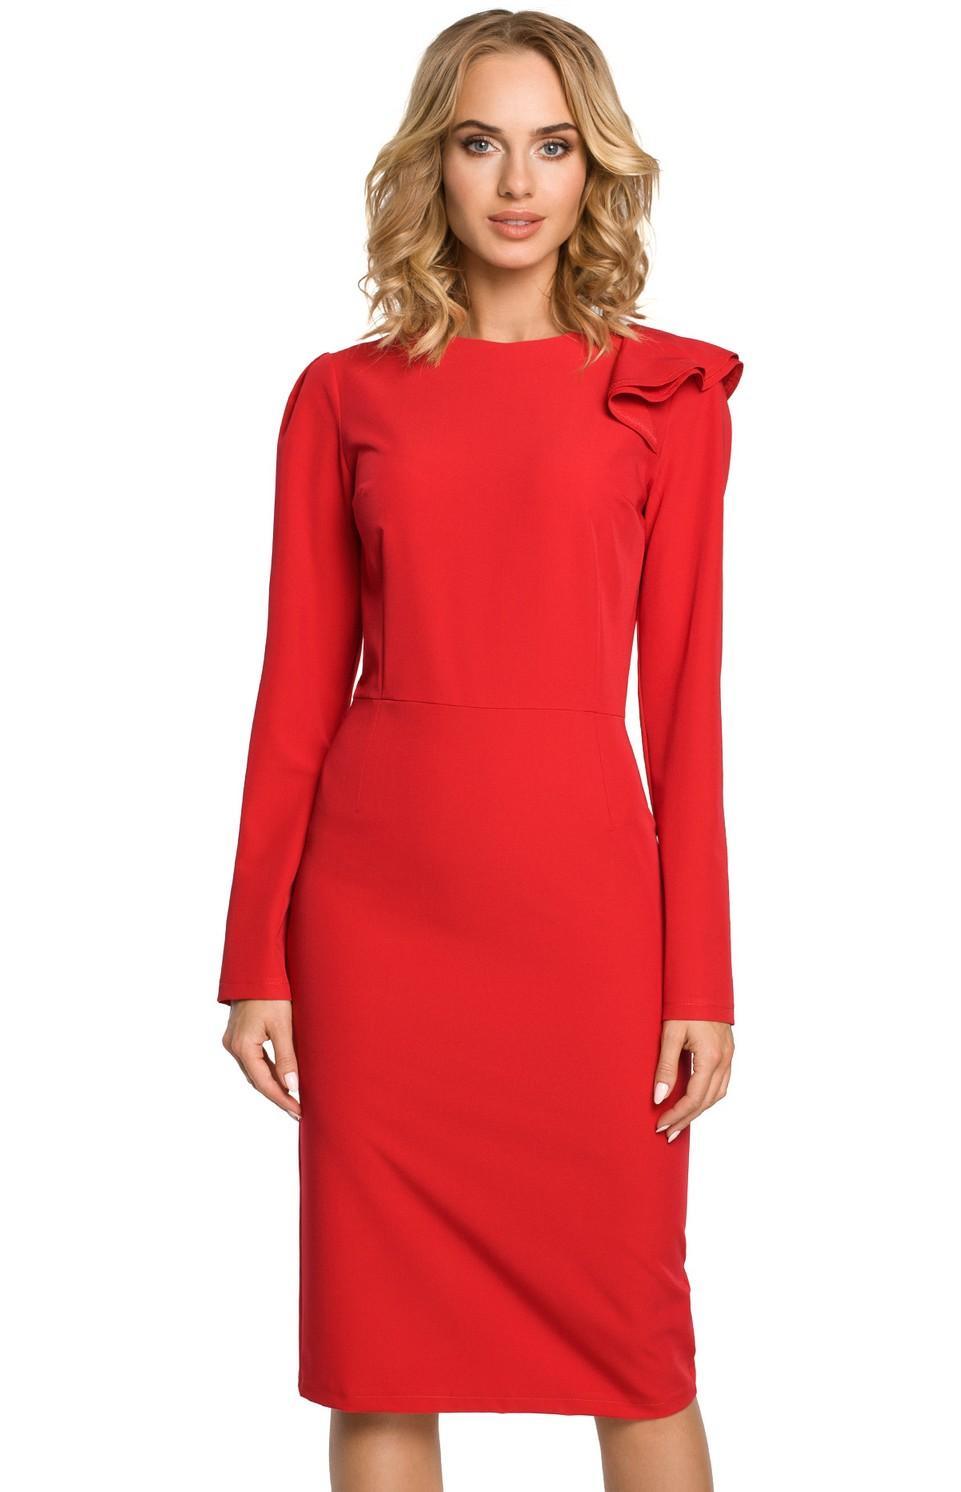 Robe rouge manche longue